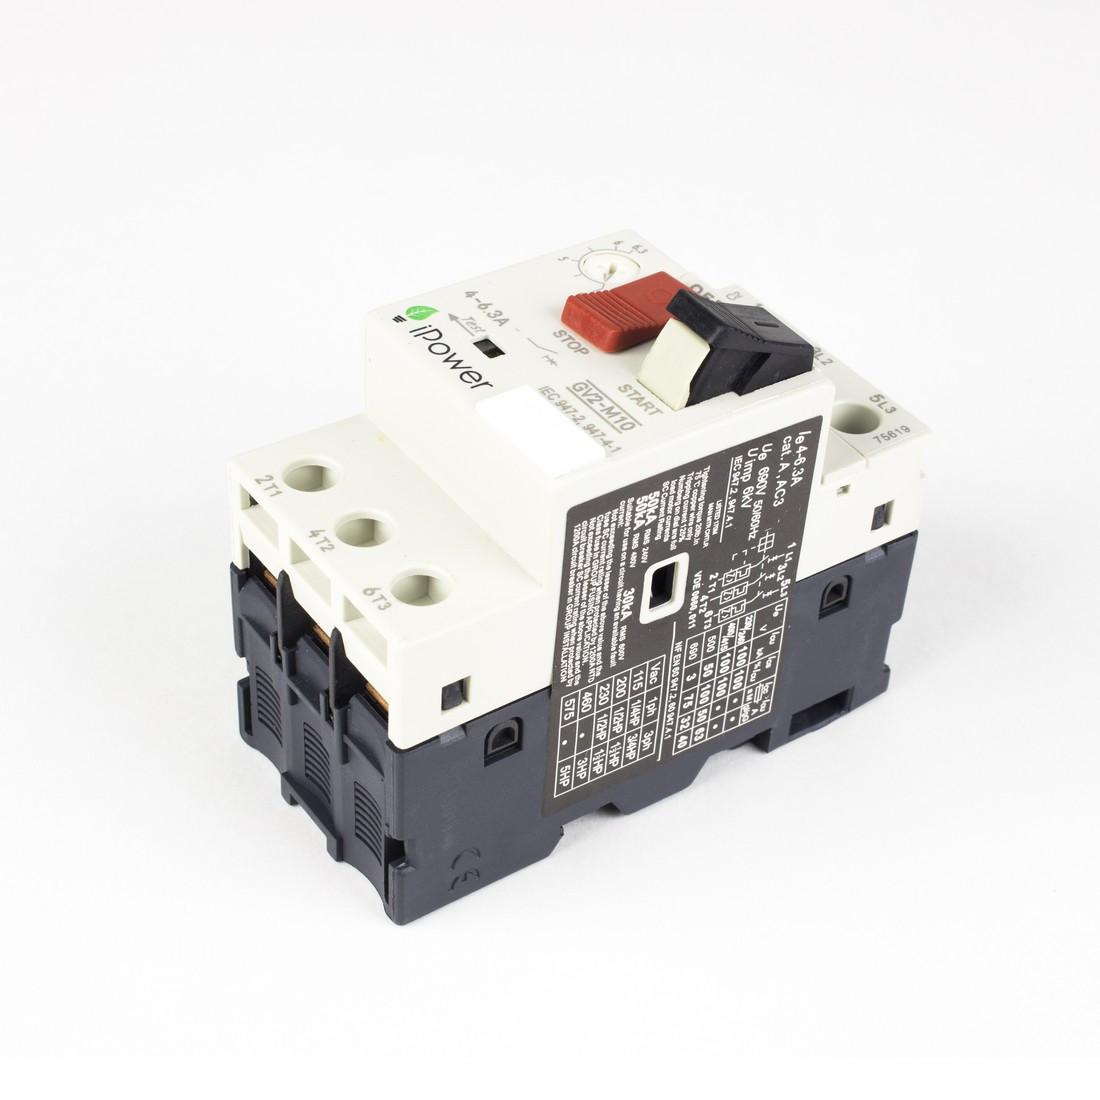 Автомат защиты двигателя iPower GV2-M06 (1-1.6A) - фото 3